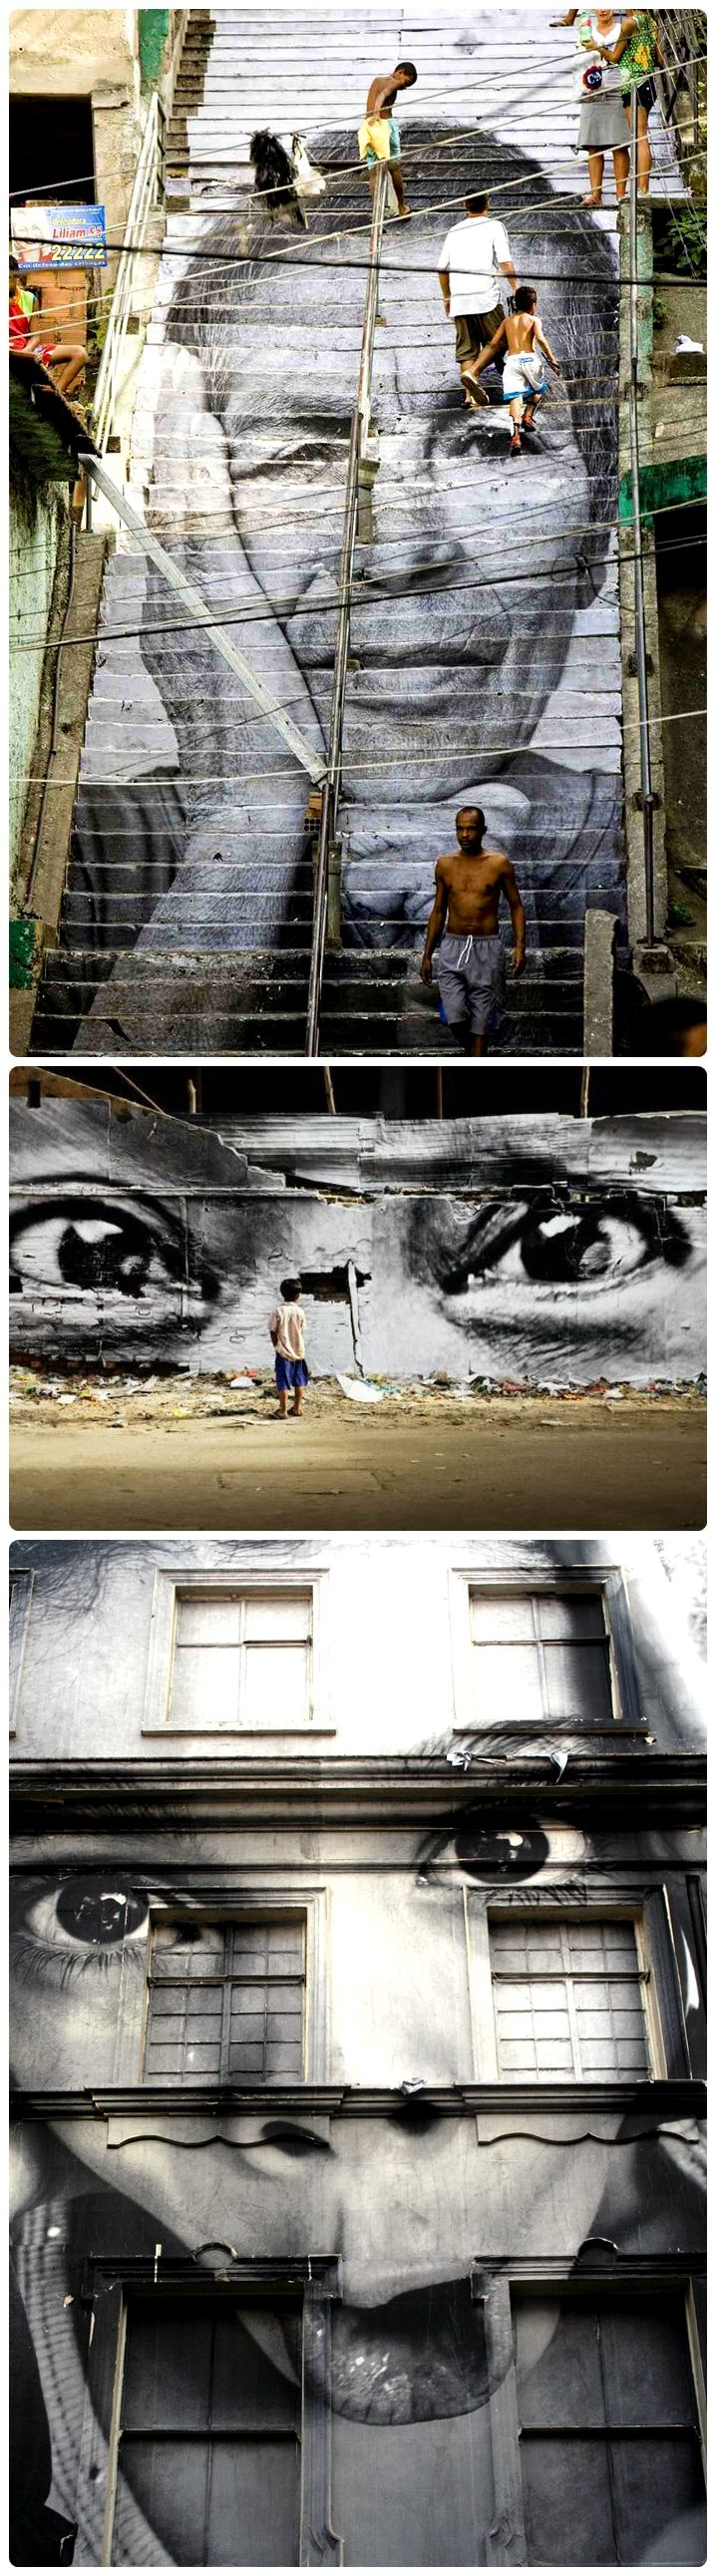 The street art of JR